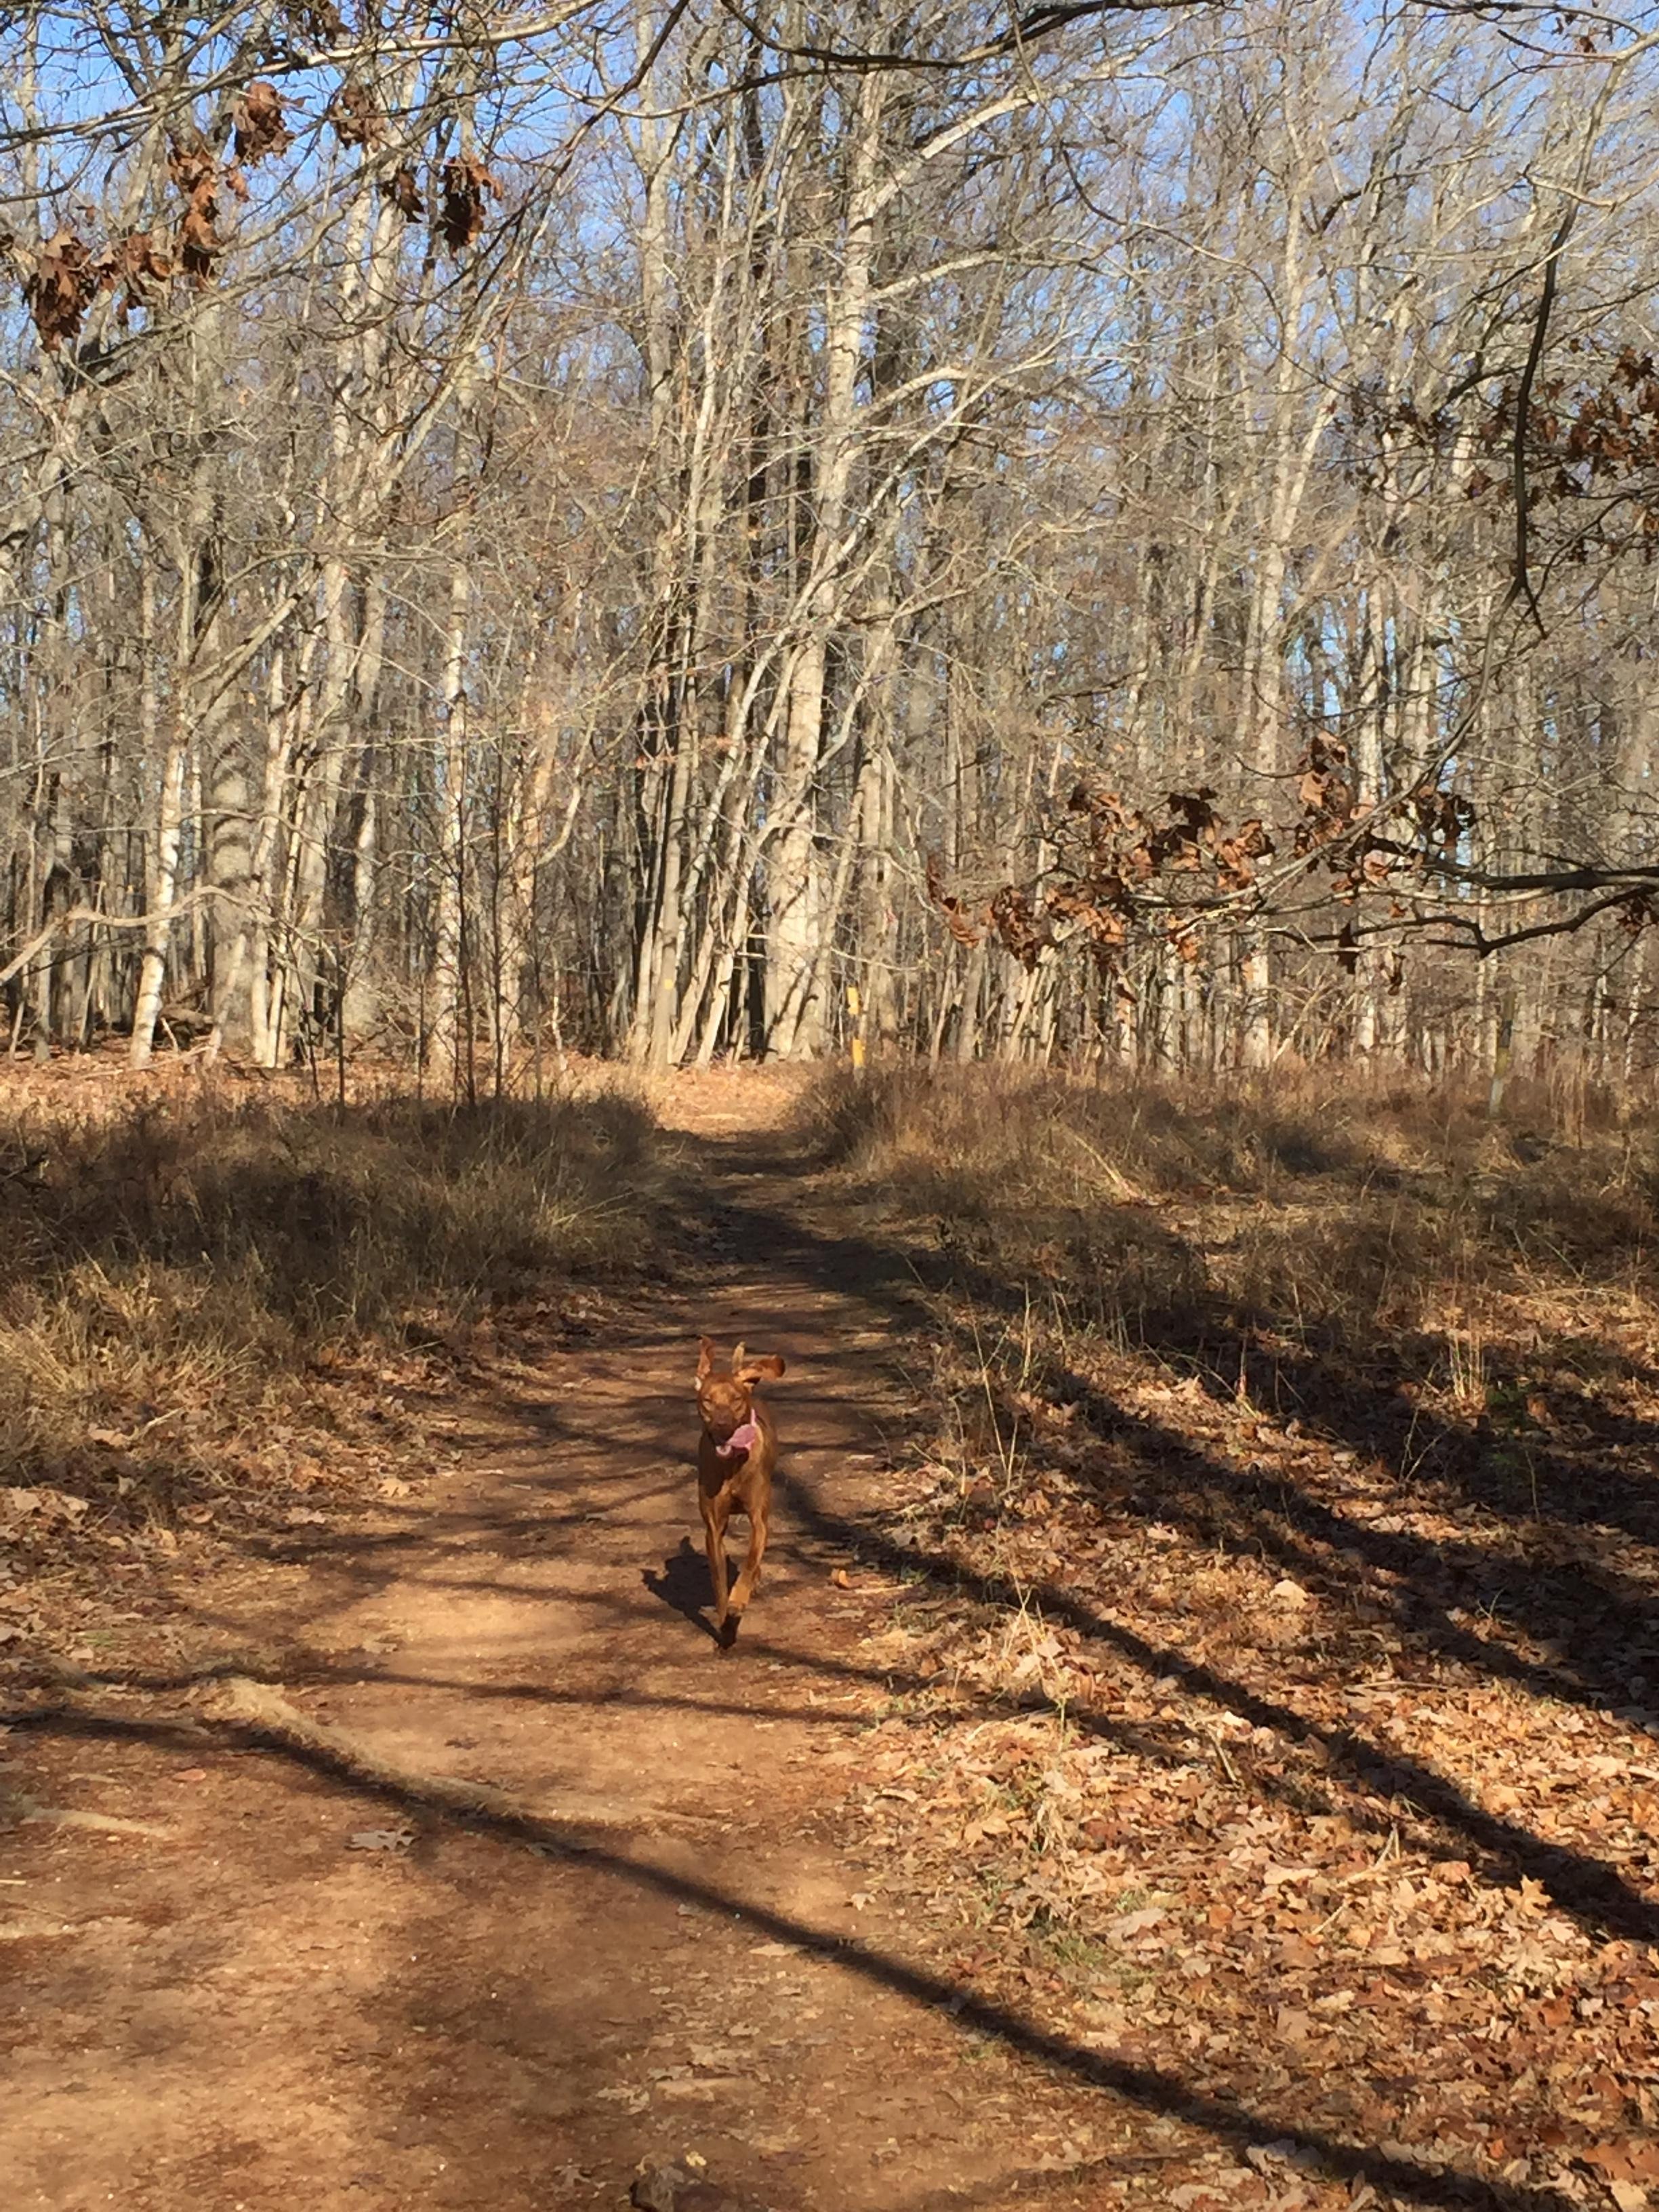 My trail running buddy